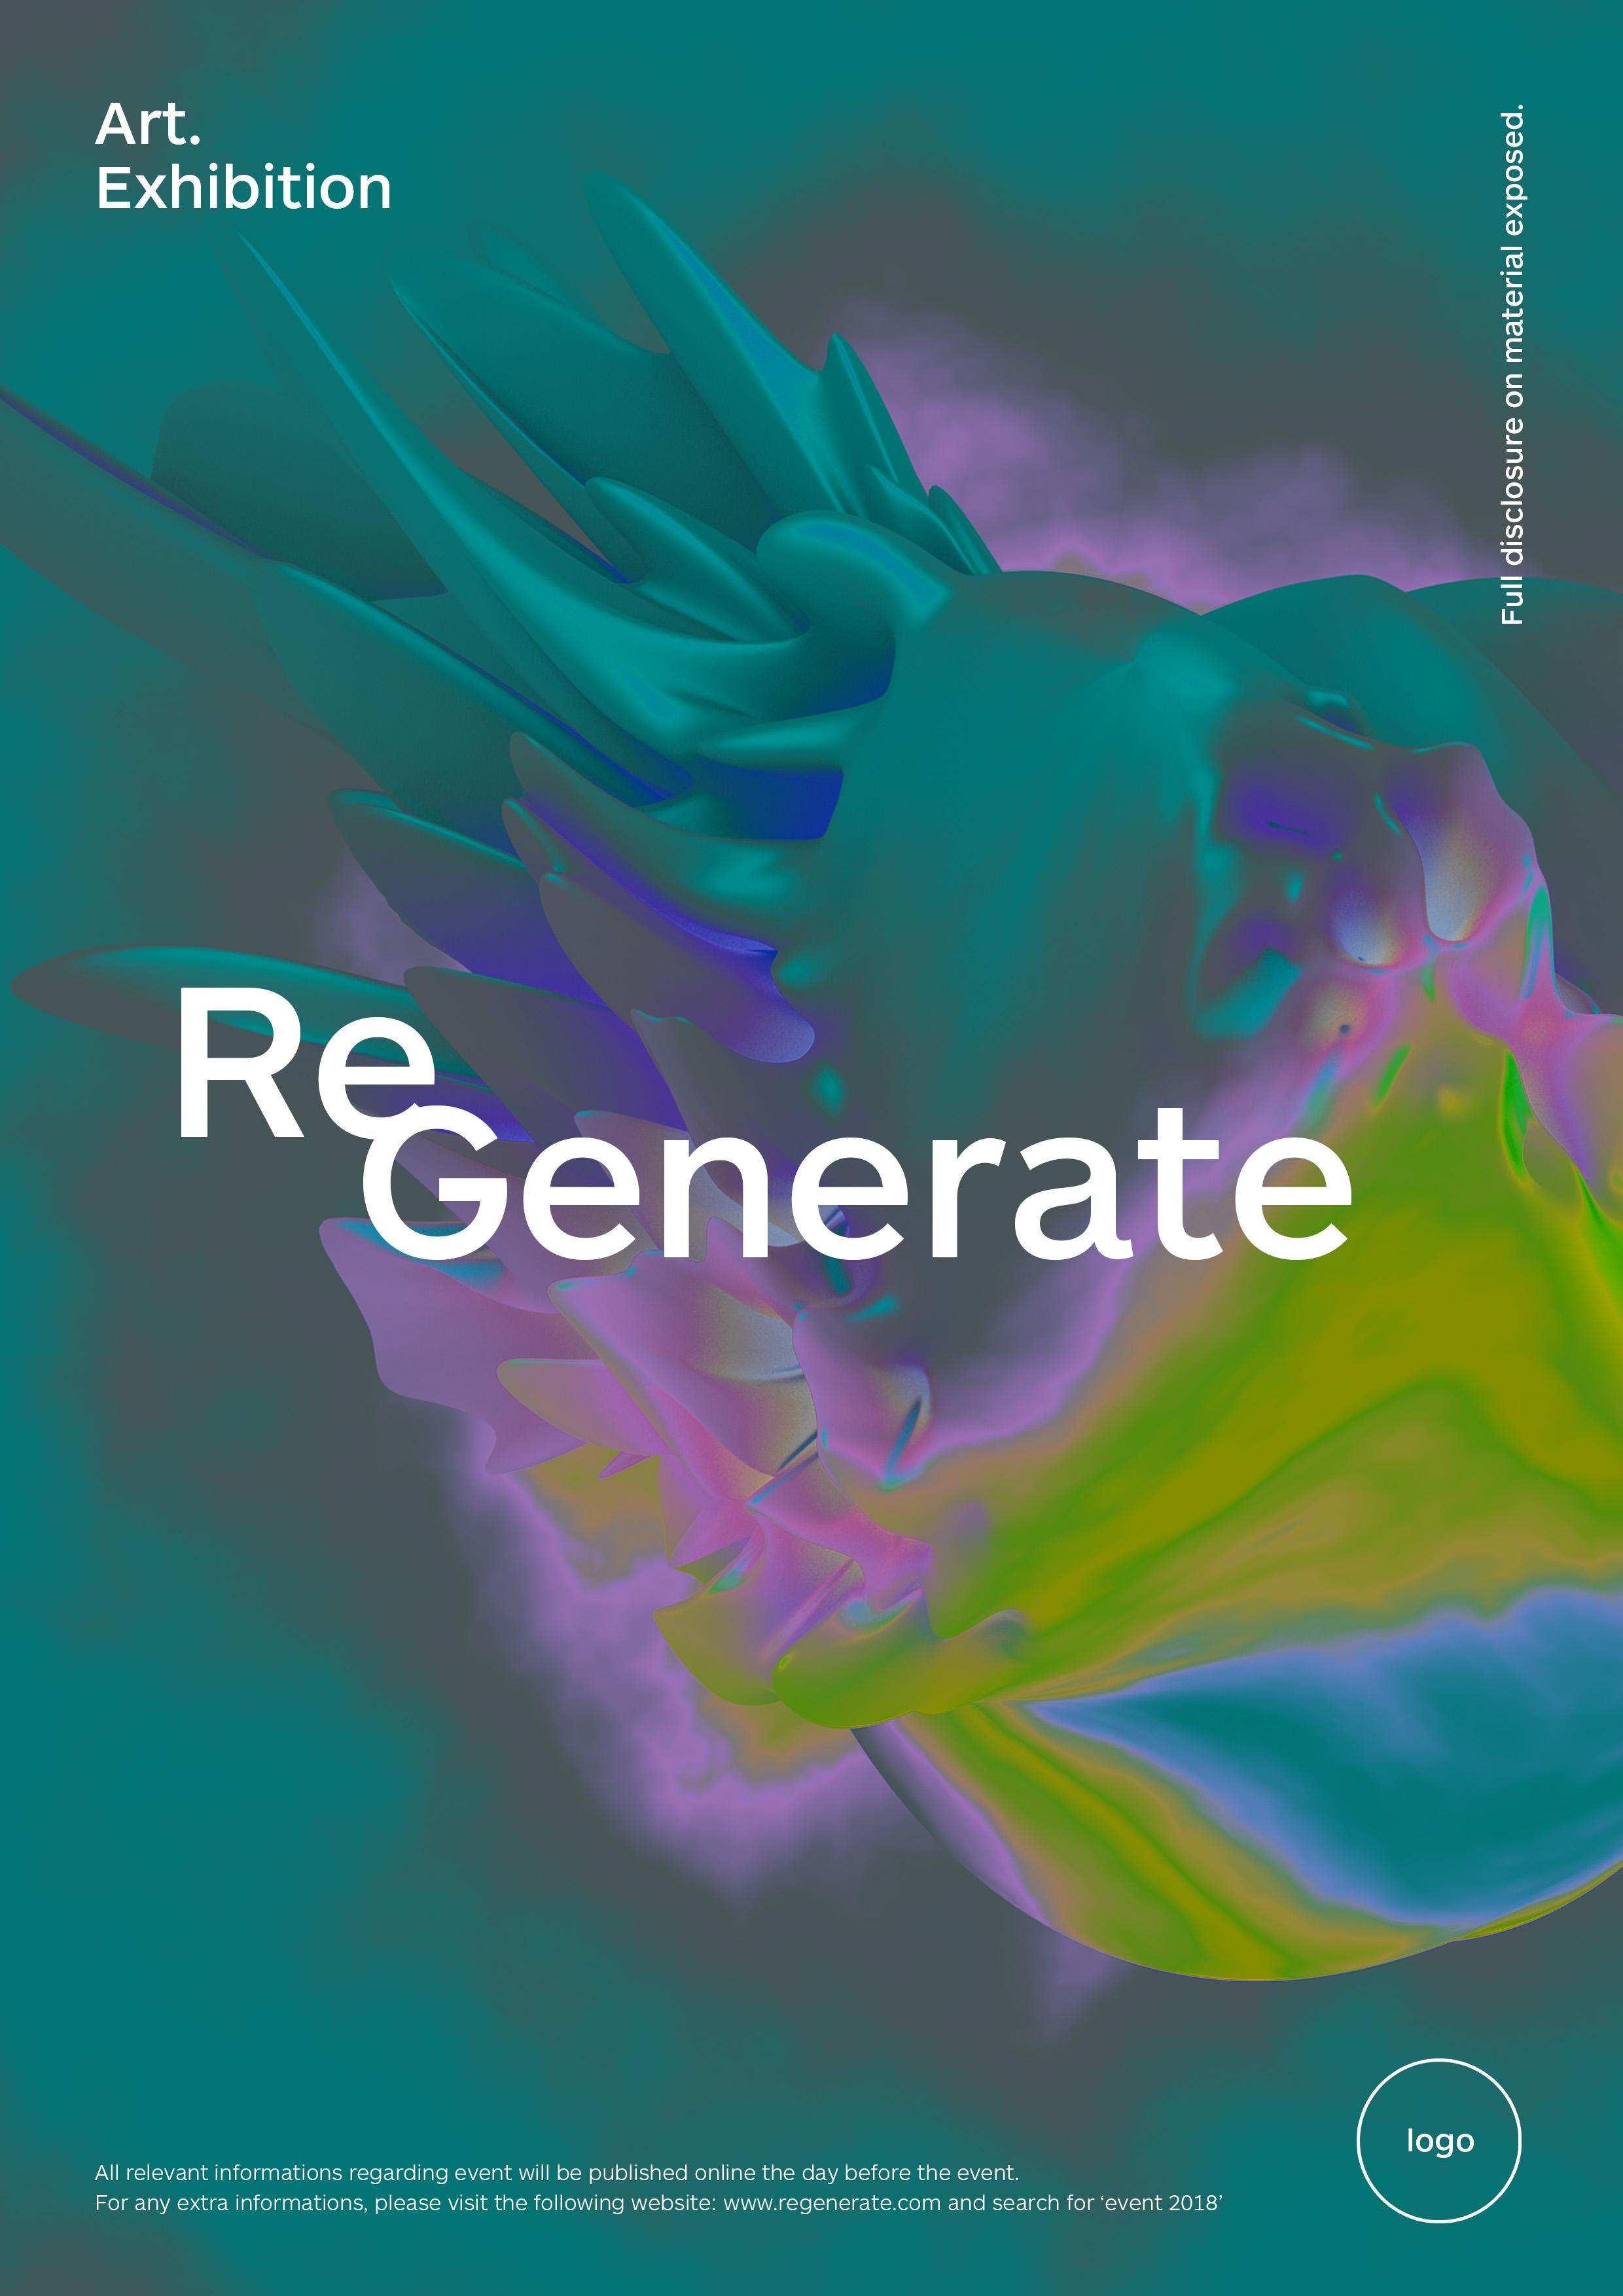 ReGenerate_Test 1_A4_005.jpg